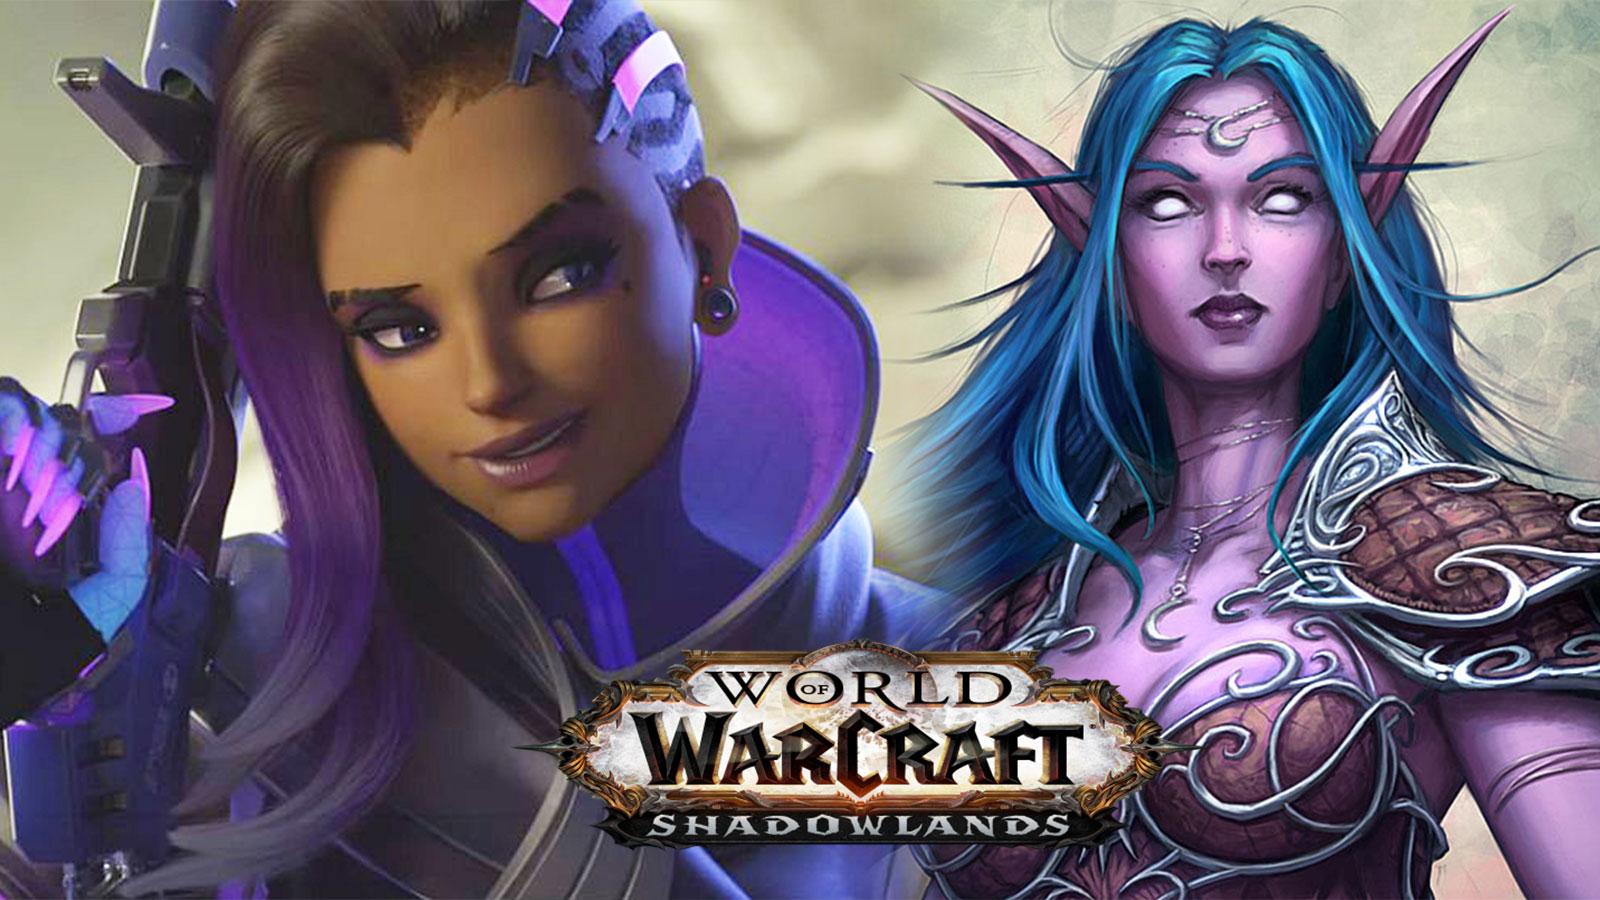 Sombra Night Elf Overwatch World of Warcraft